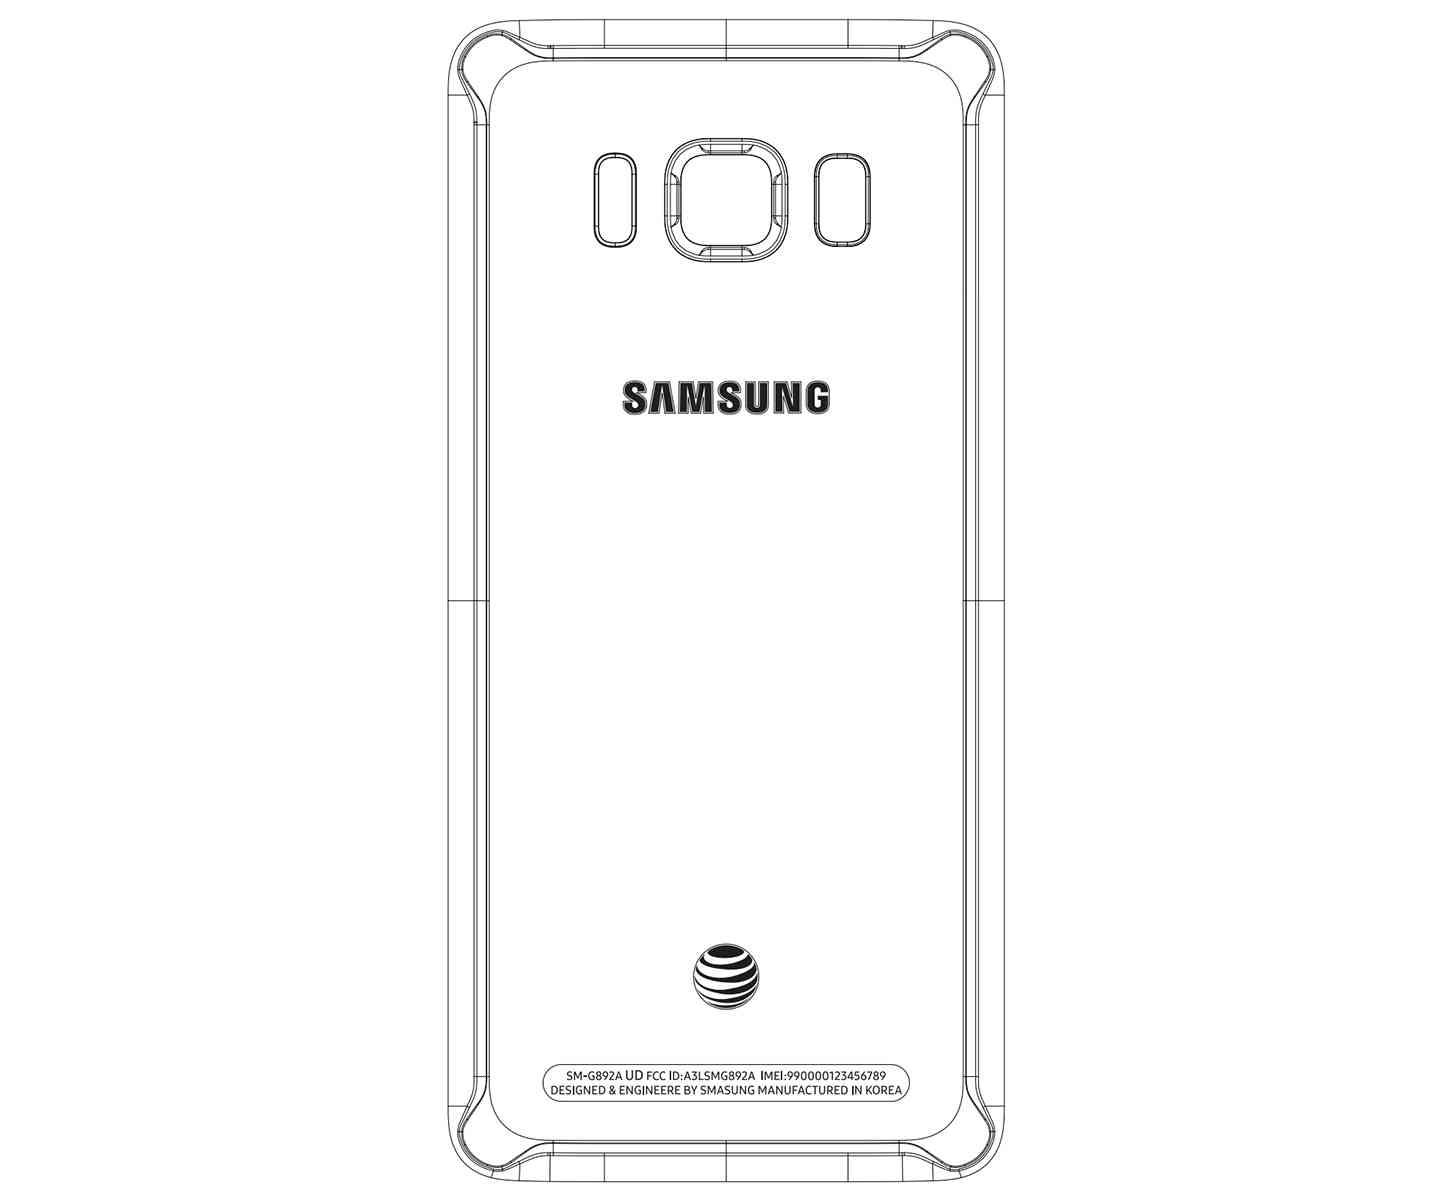 Samsung Galaxy S8 Active AT&T FCC leak